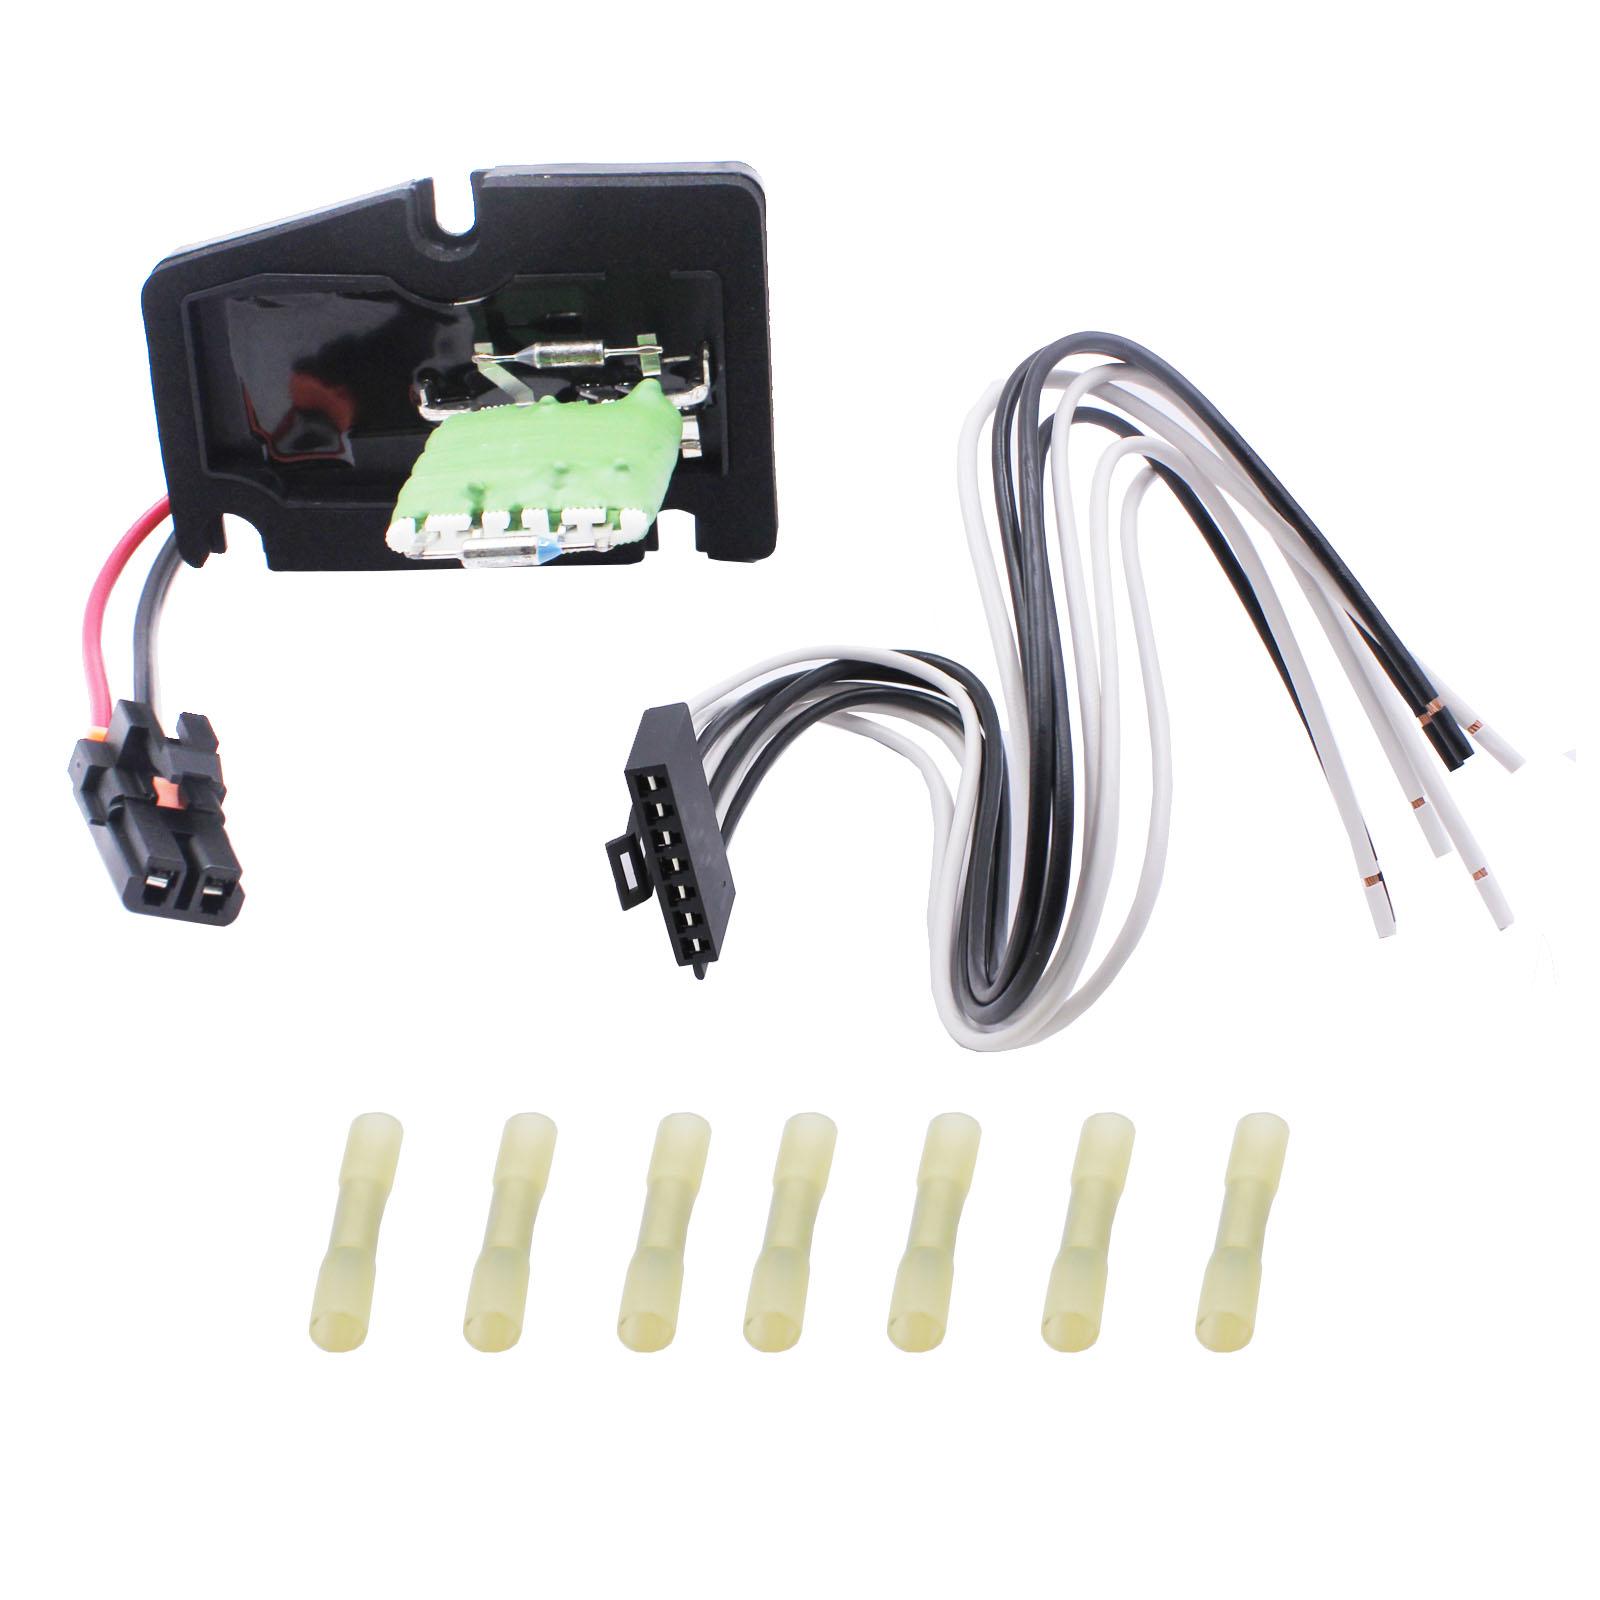 HVAC Heater Blower Motor Resistor w/ Harness For Oldsmobile Buick Chevy |  eBayeBay